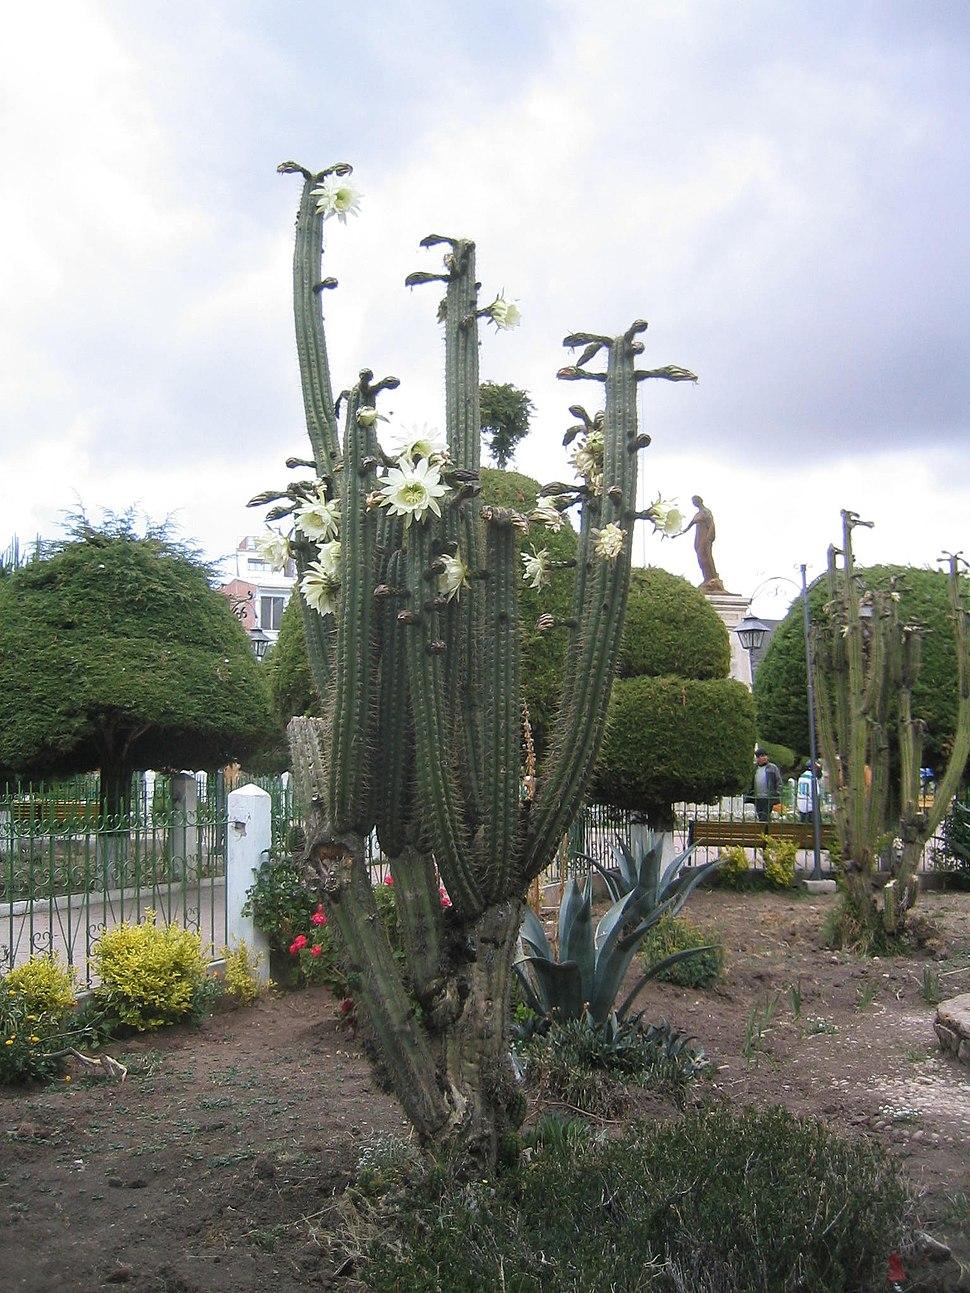 Flowering San Pedro cactus